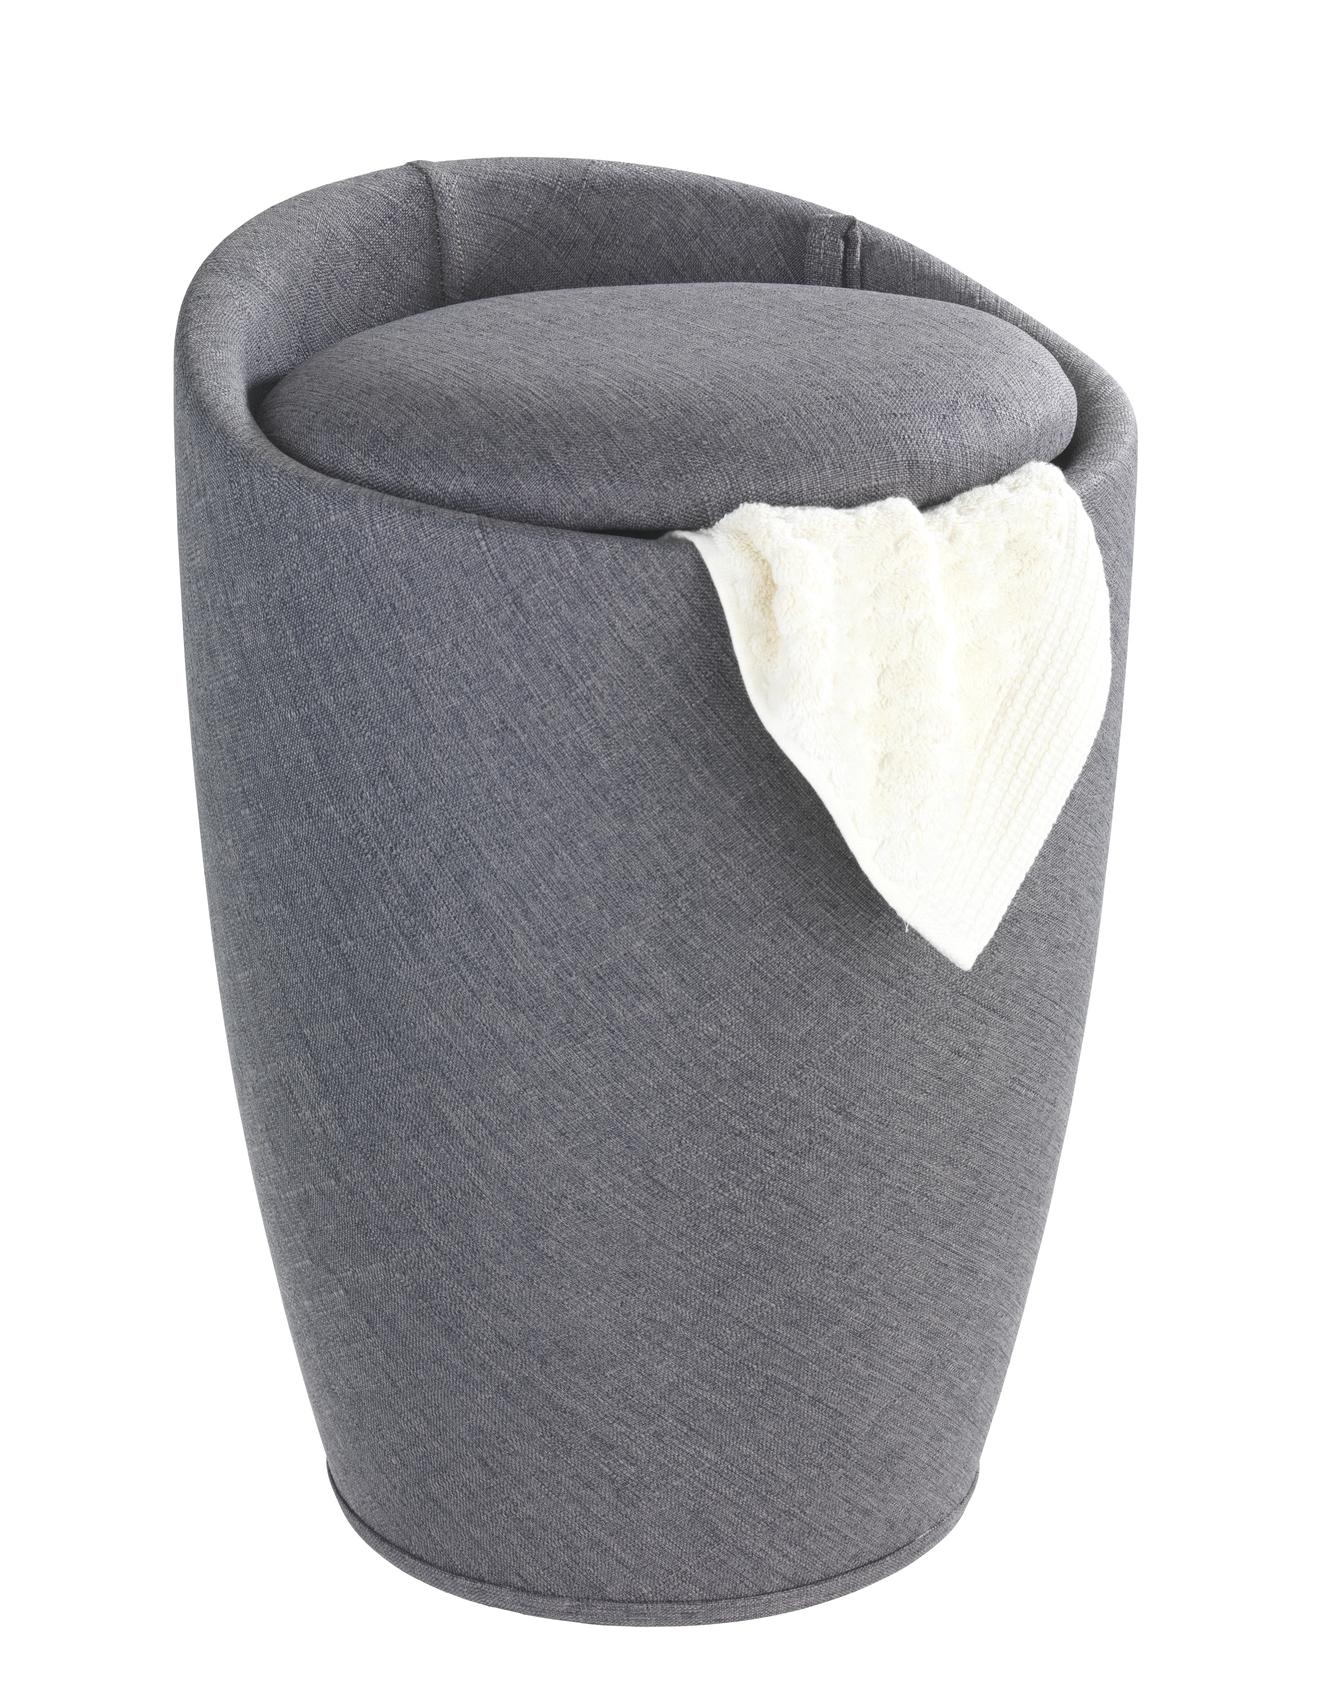 Cos de rufe / Taburet din plastic, tapitat cu stofa, Candy Gri Inchis, Ø36xH50,5 cm poza